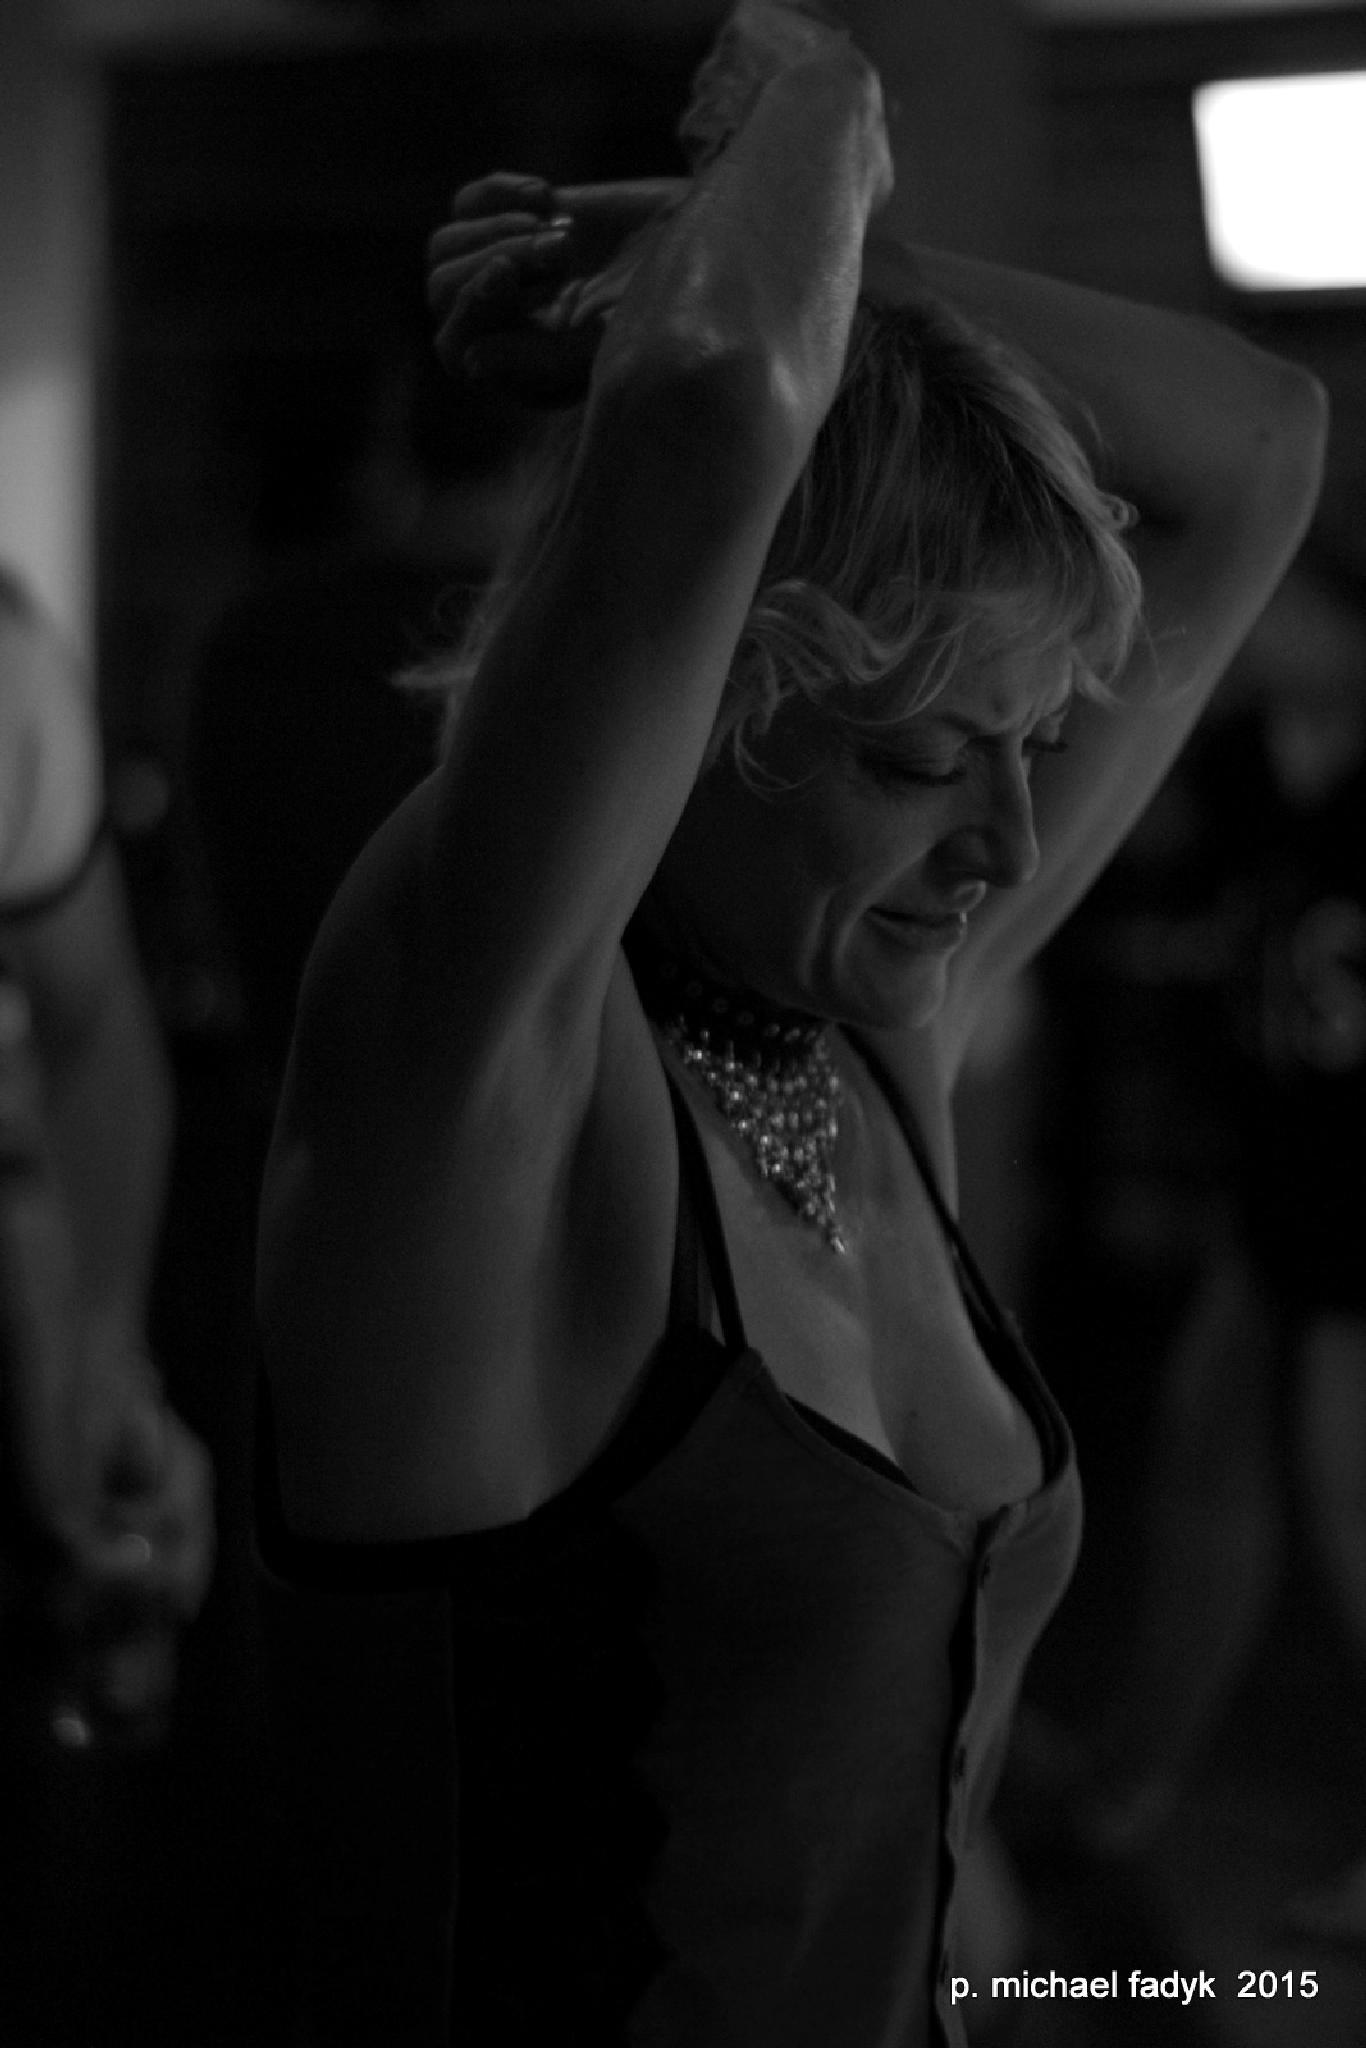 lady dancing 1 by P. Michael Fadyk